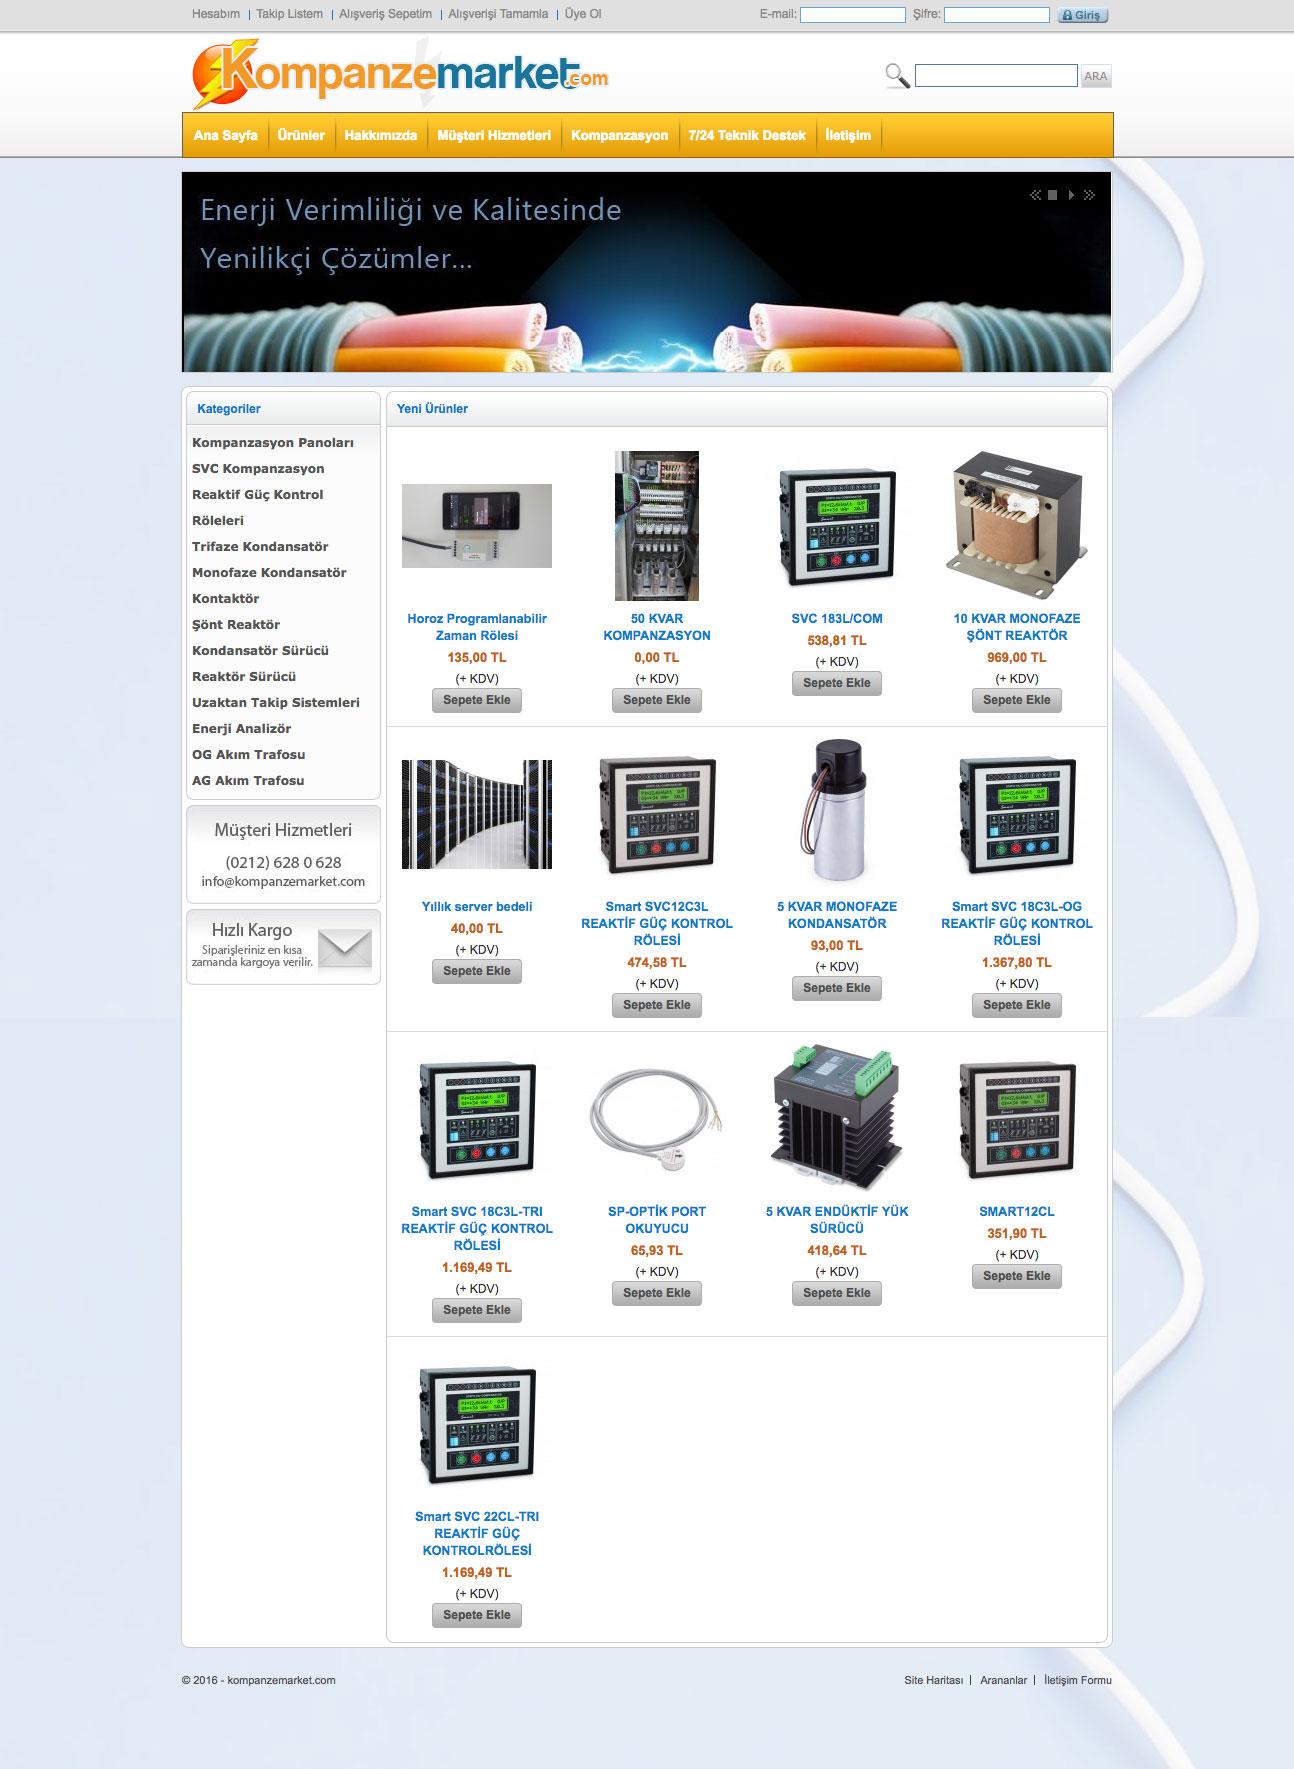 Kompanze Market Web Sitesi